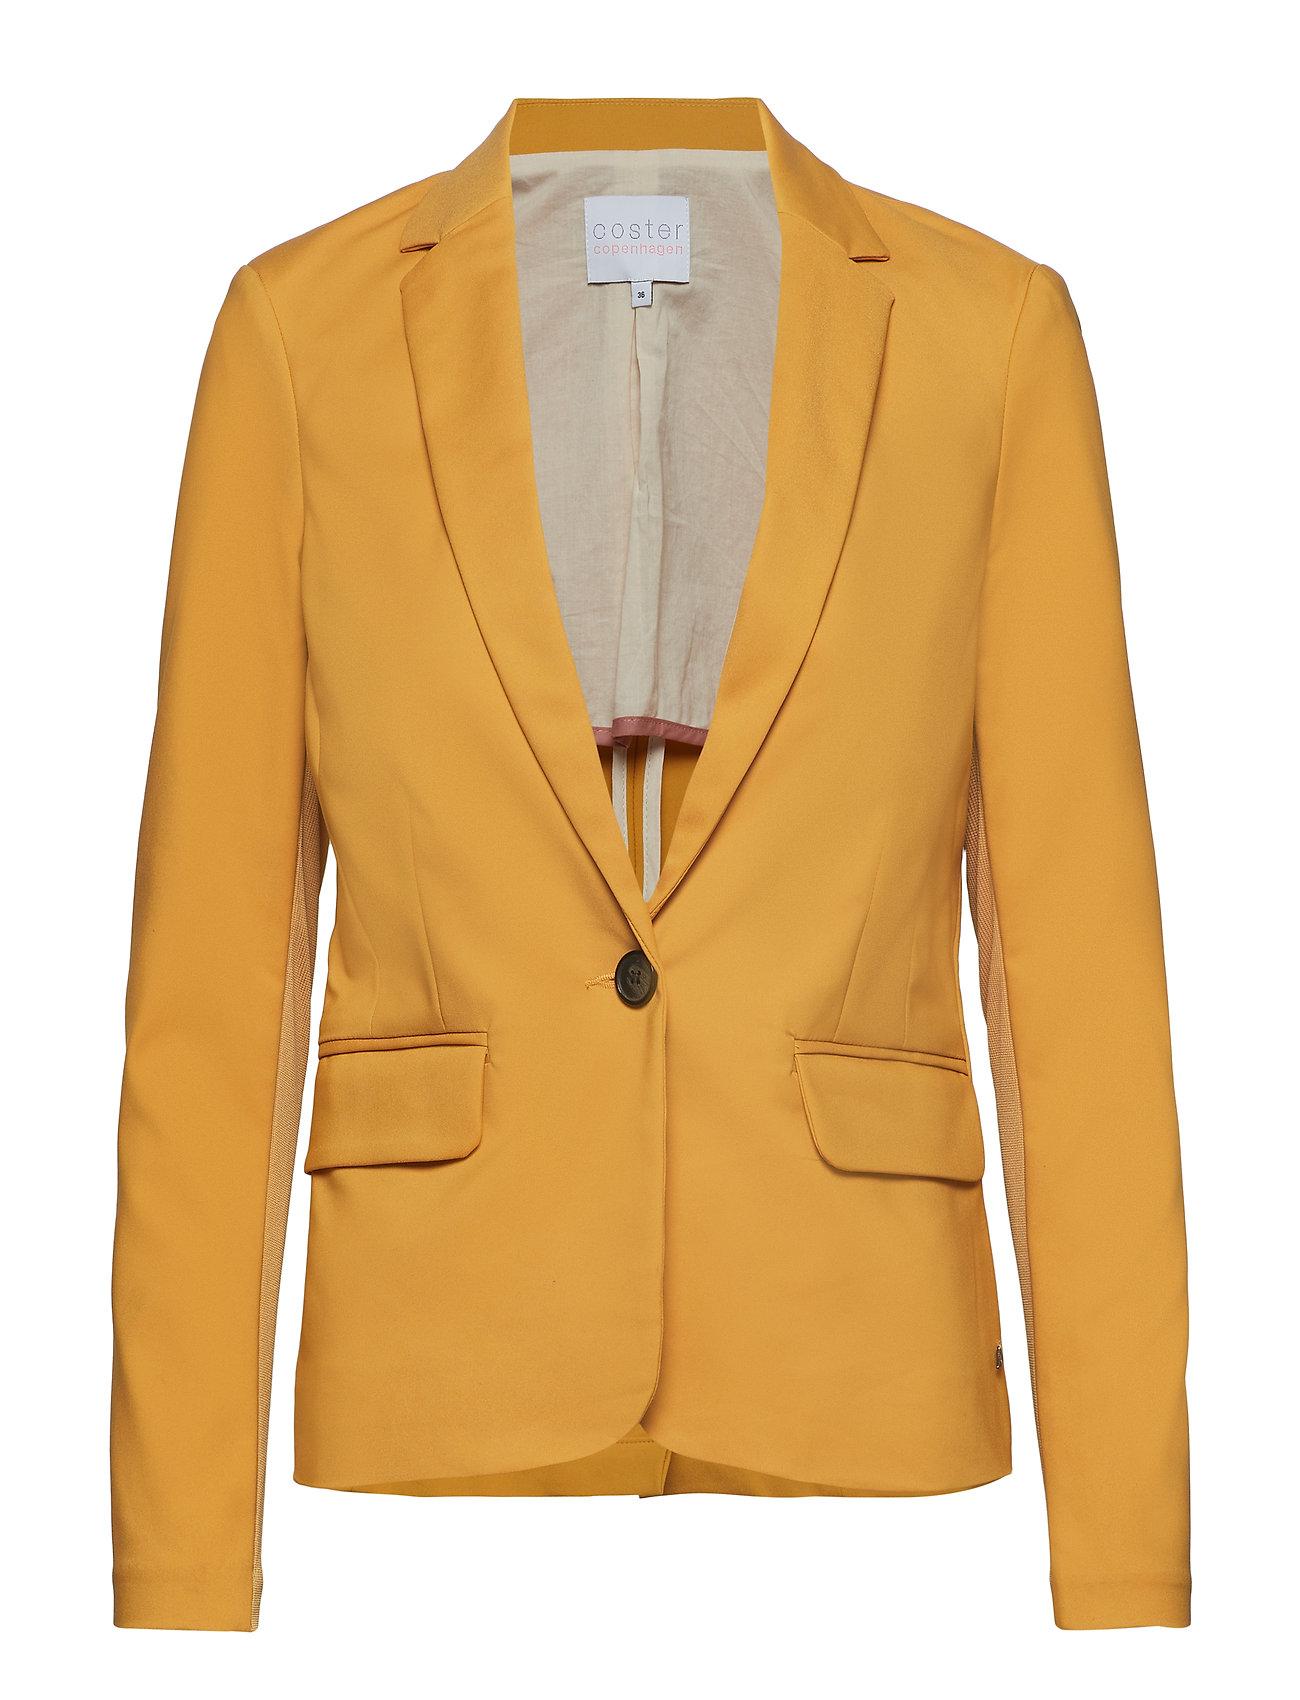 Coster Copenhagen Suit jacket - GOLD SPICE